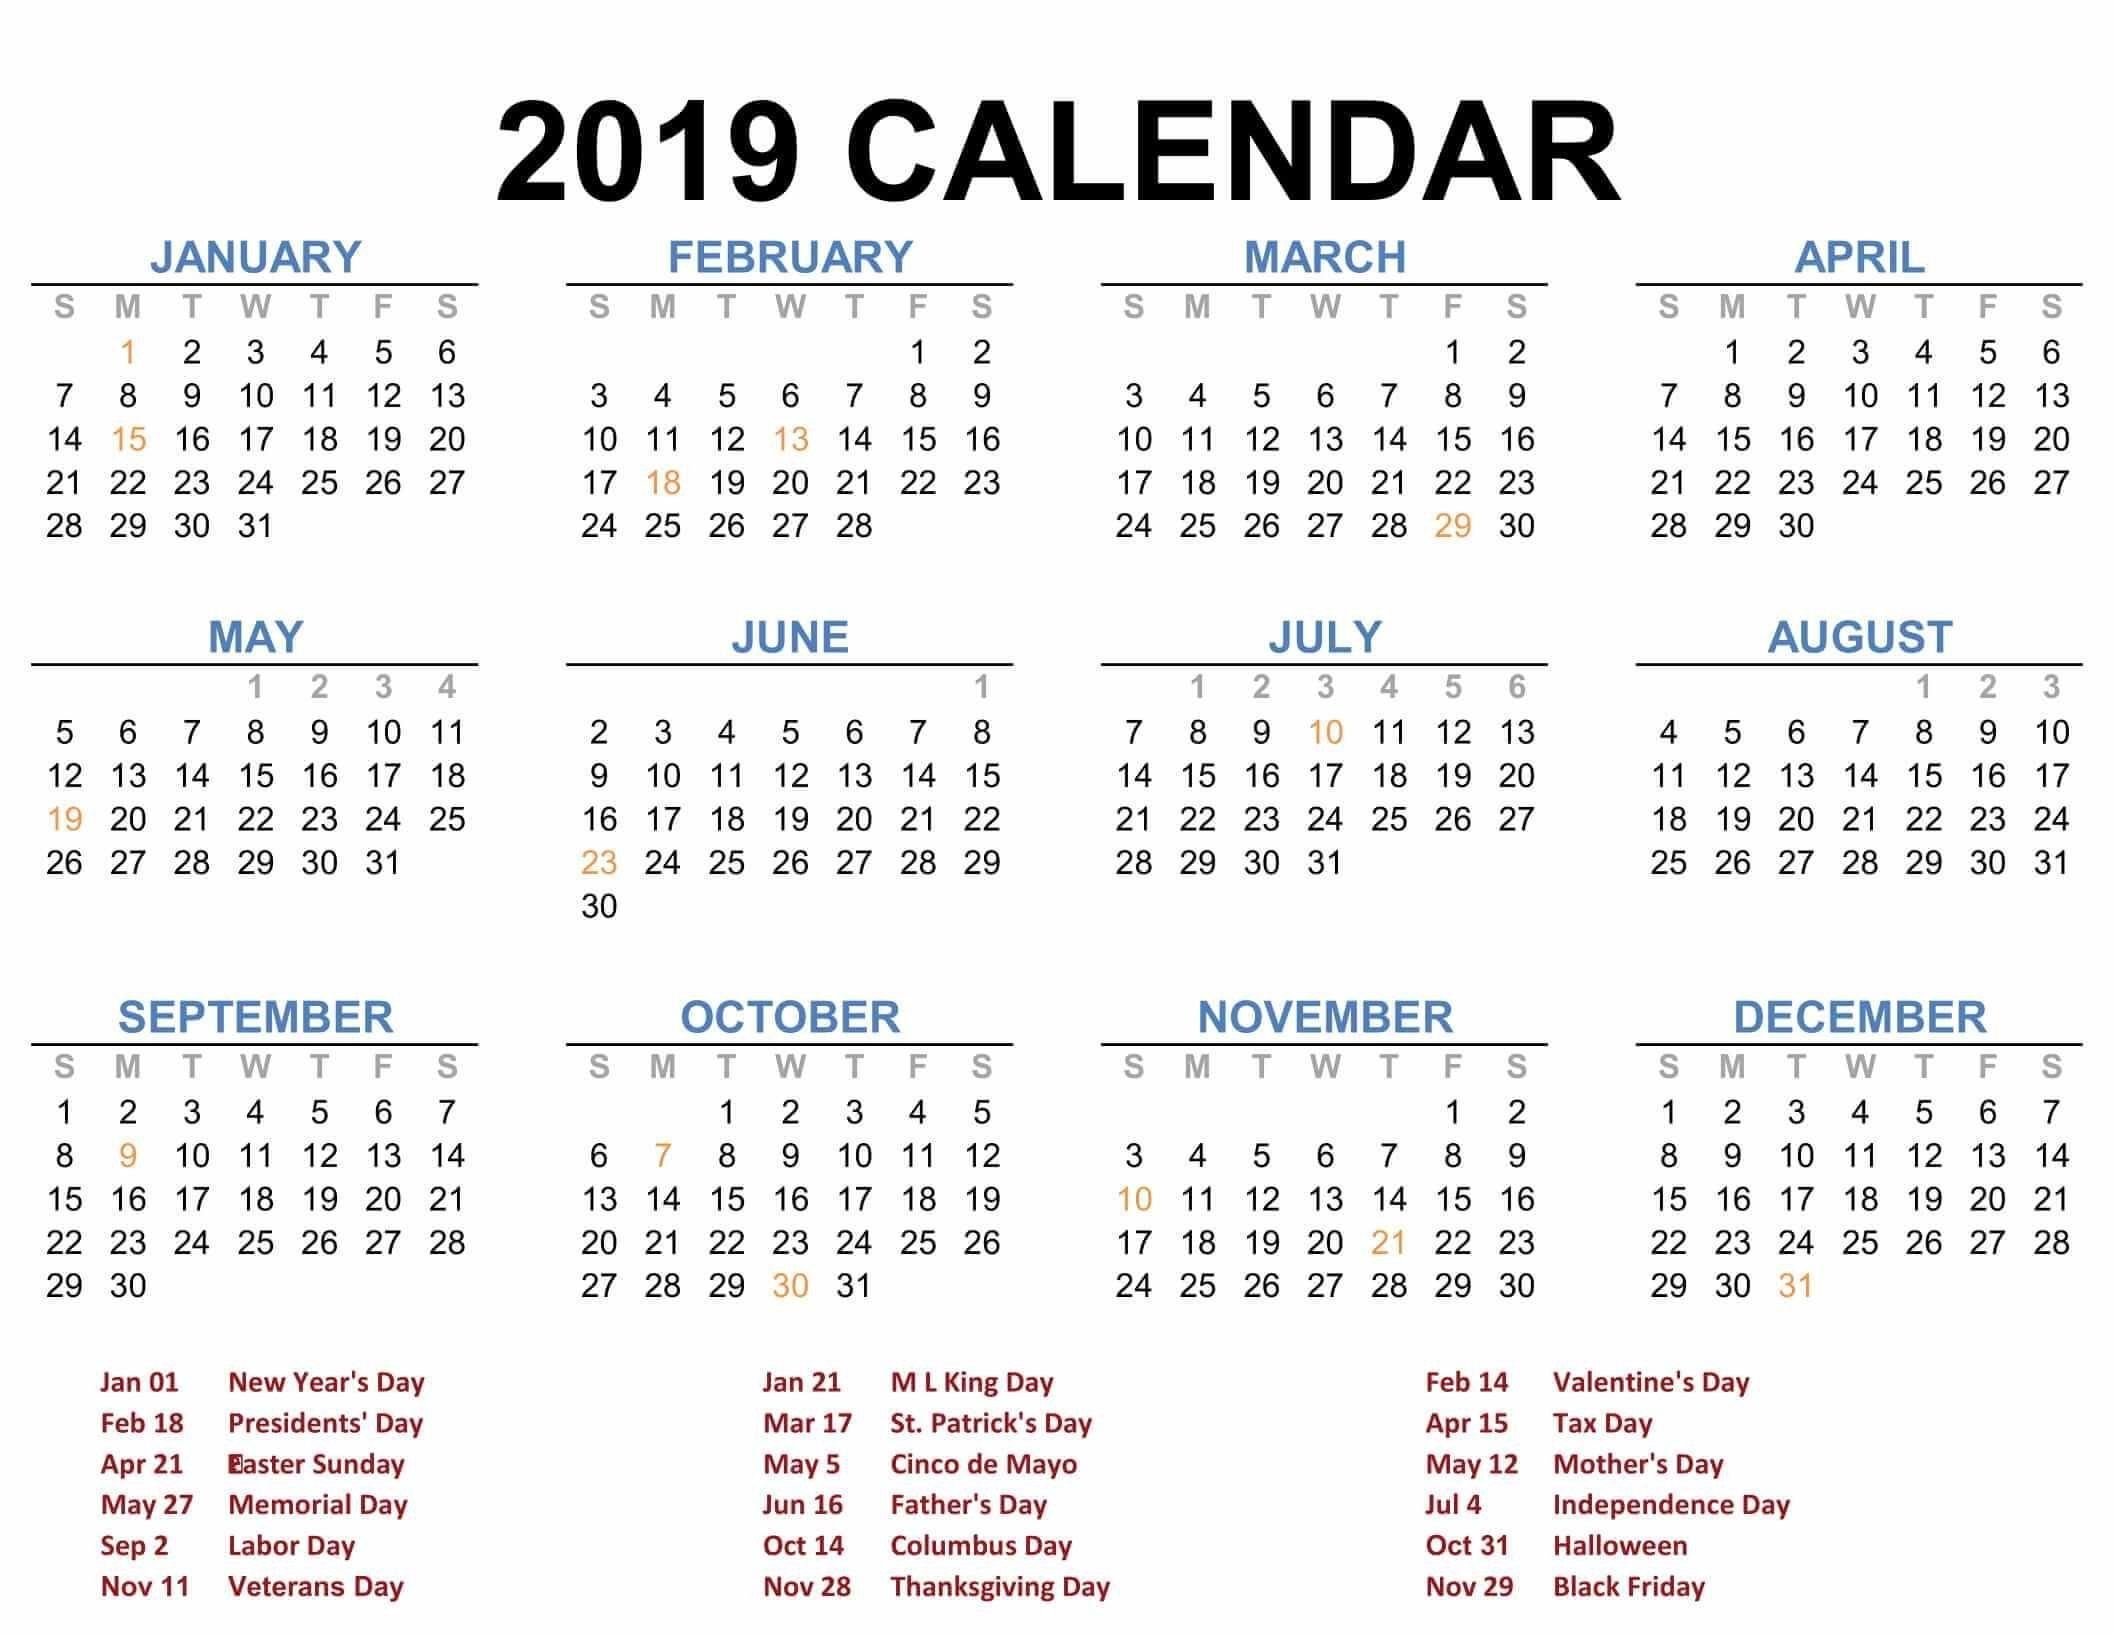 2019 Printable Calendar Templates - Pdf Excel Word - Free Printable Calendar 2019 Annual